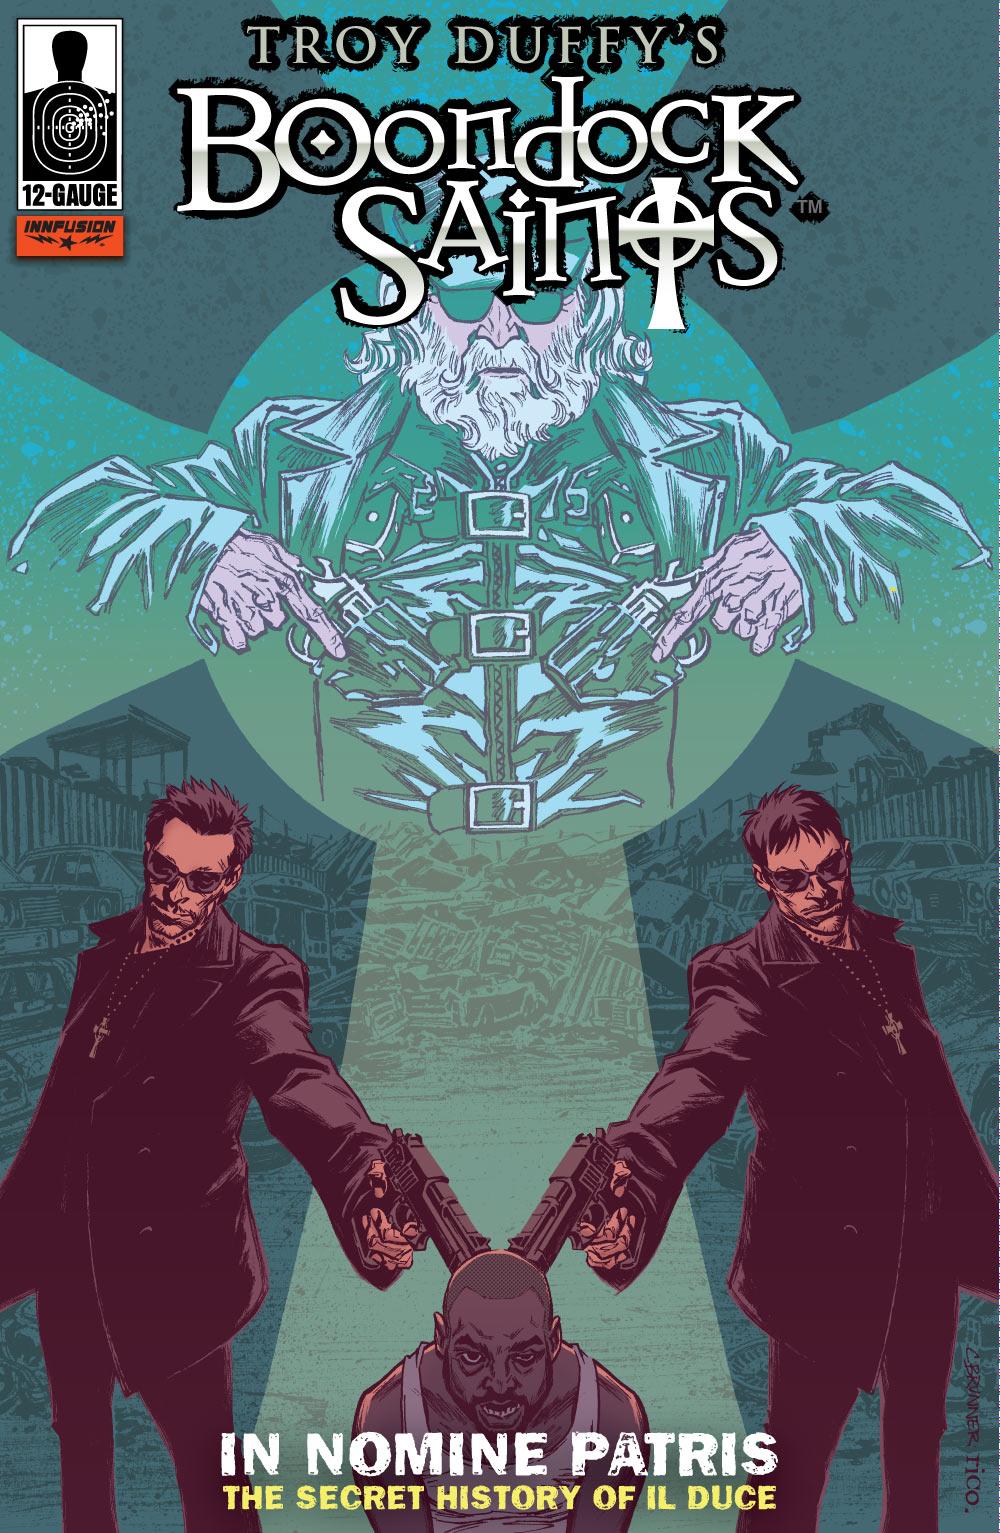 Boondock Saints #2